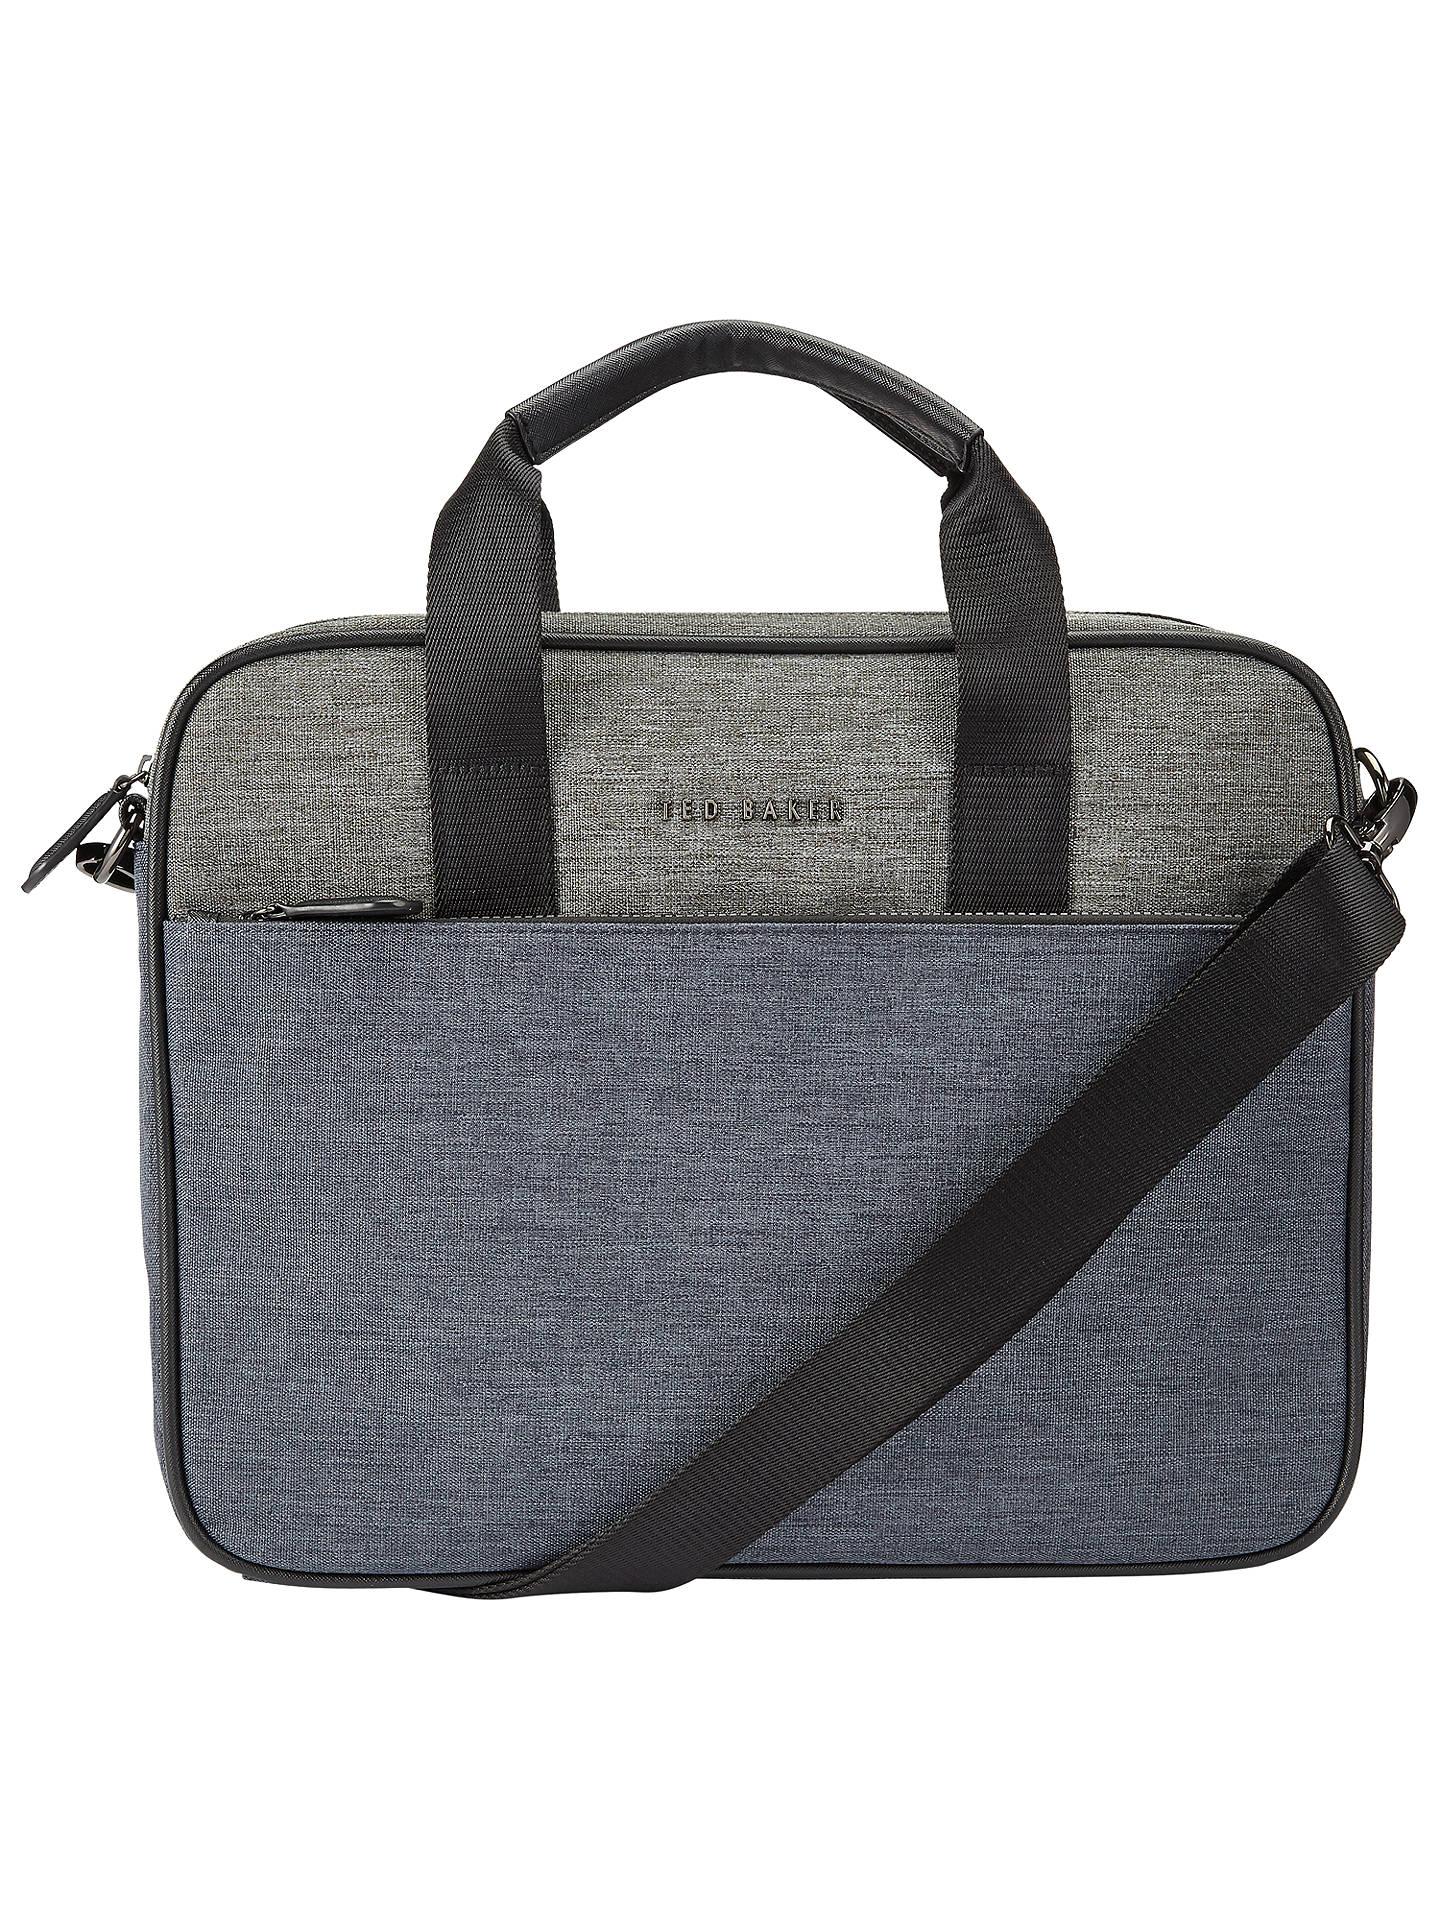 6feae2de861d Buy Ted Baker Piranha Document Bag